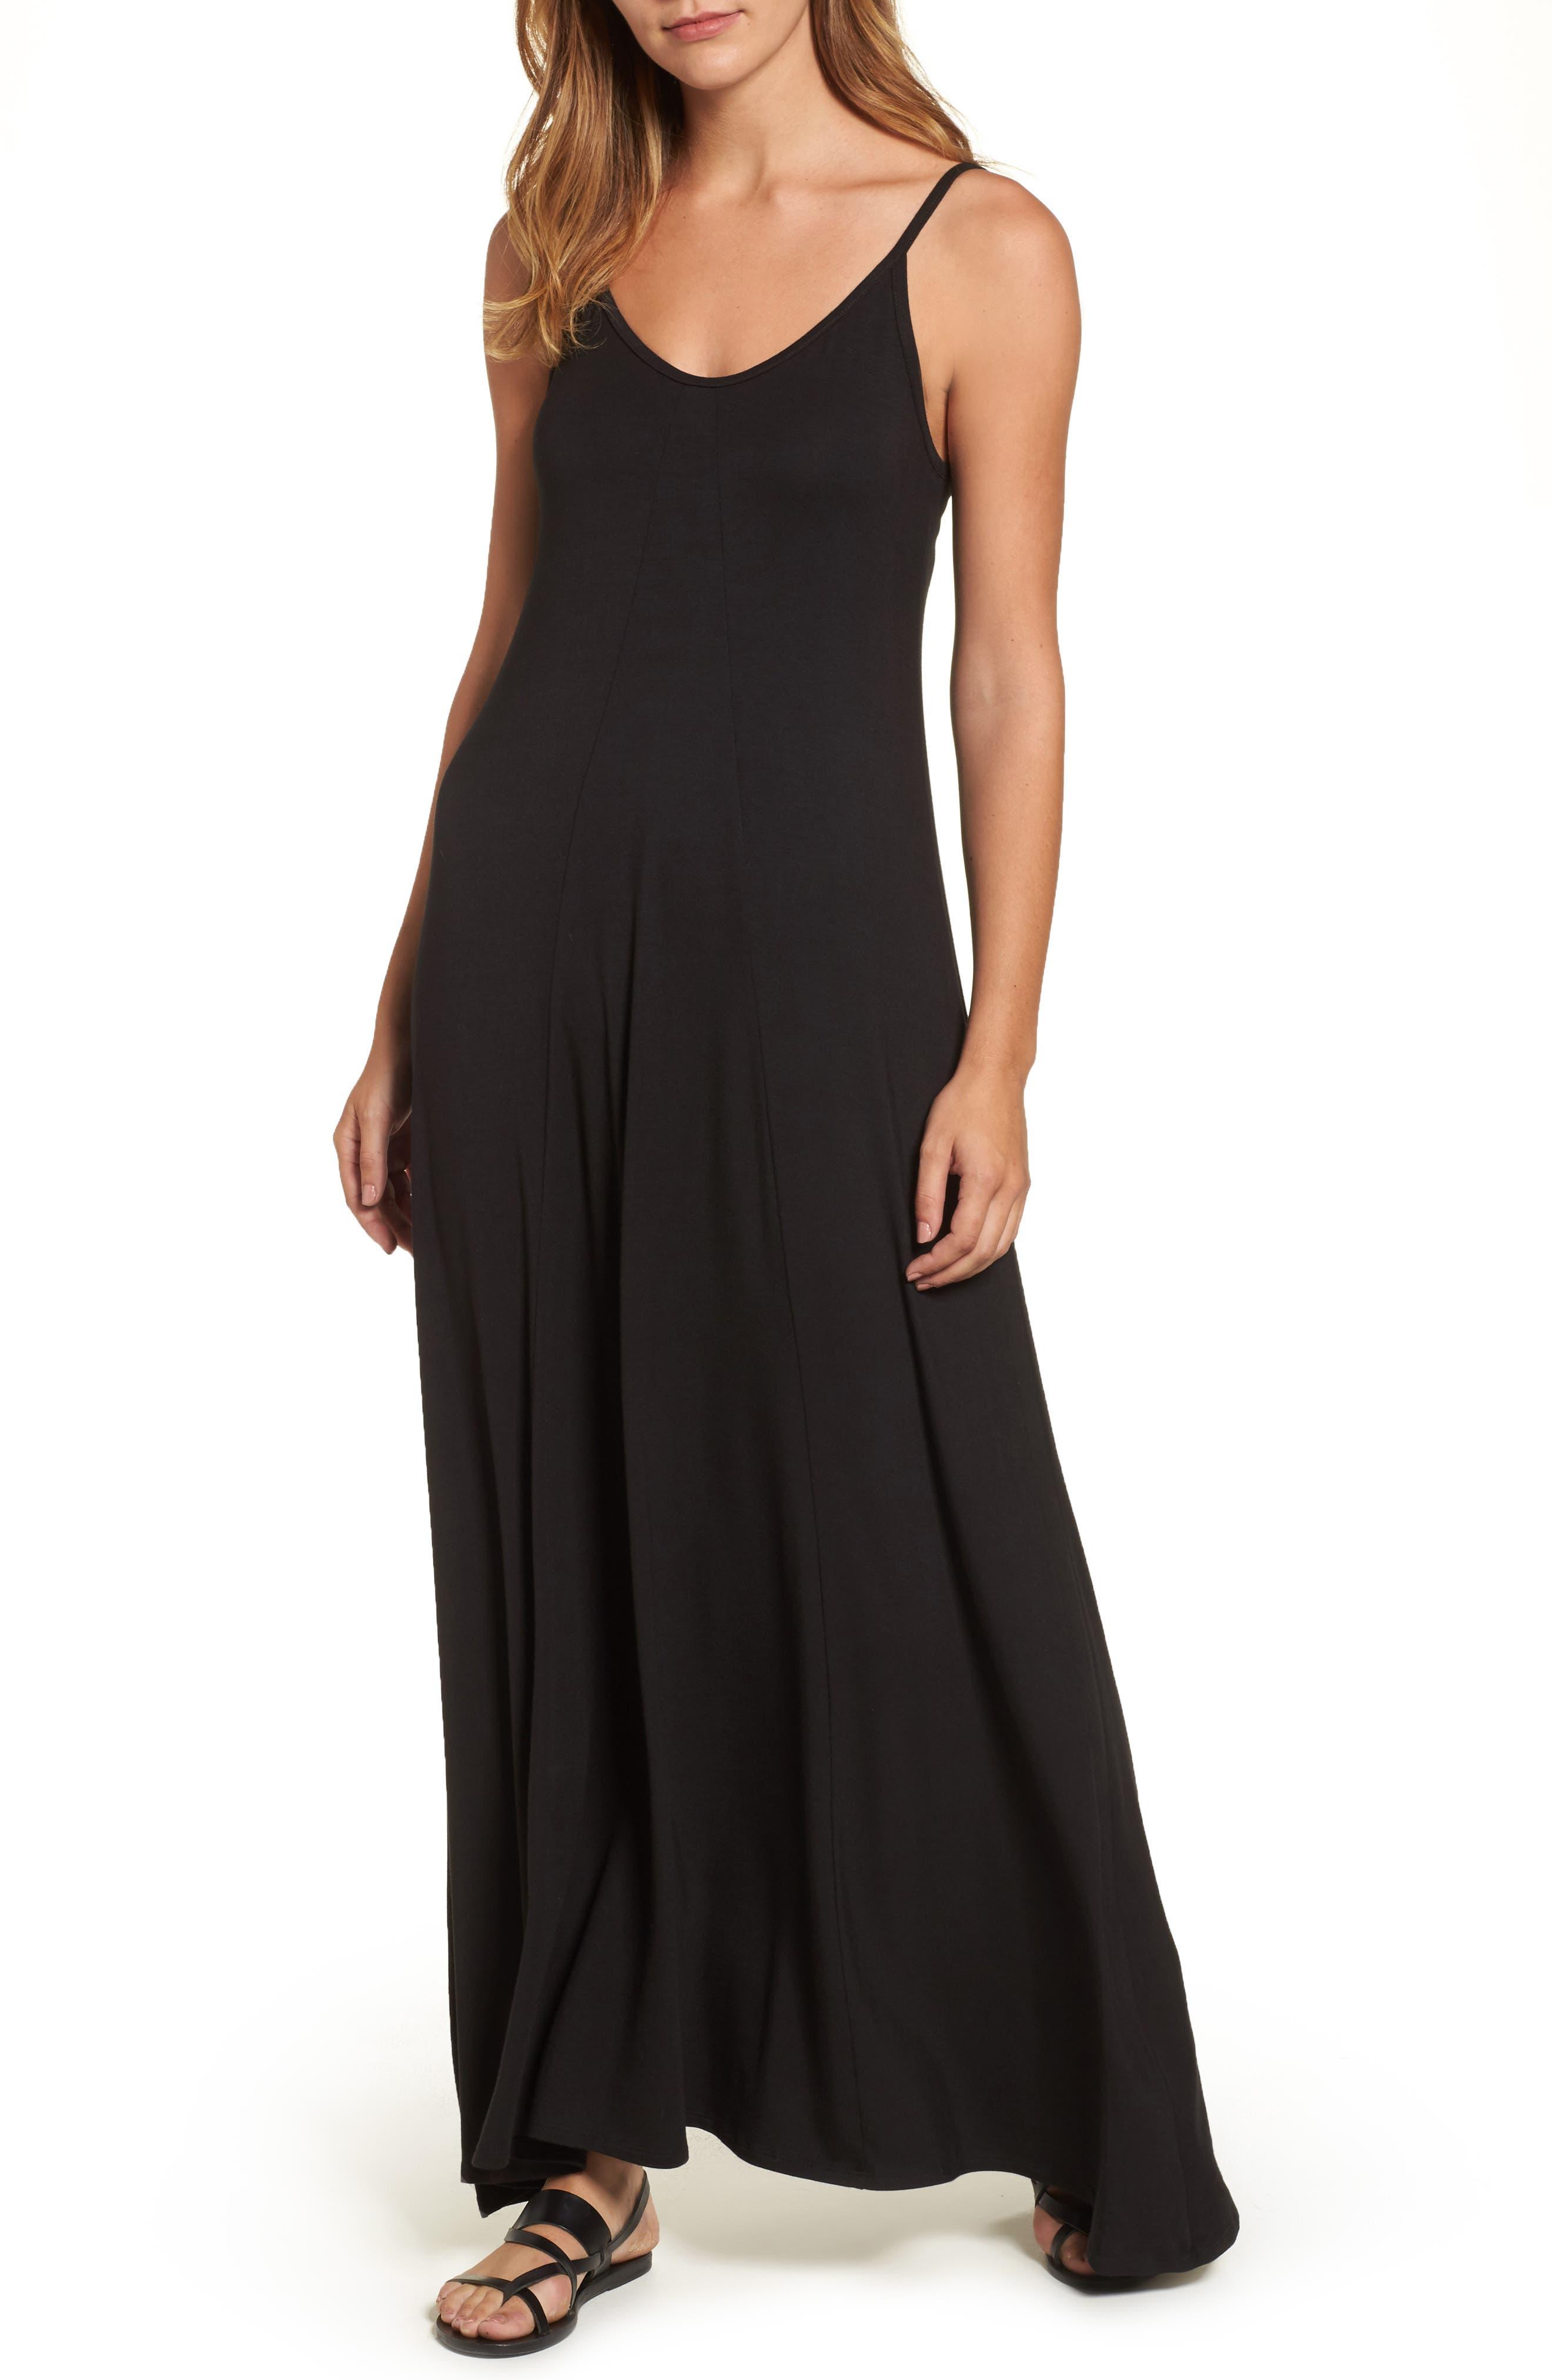 LOVEAPPELLA, Knit Maxi Dress, Main thumbnail 1, color, BLACK